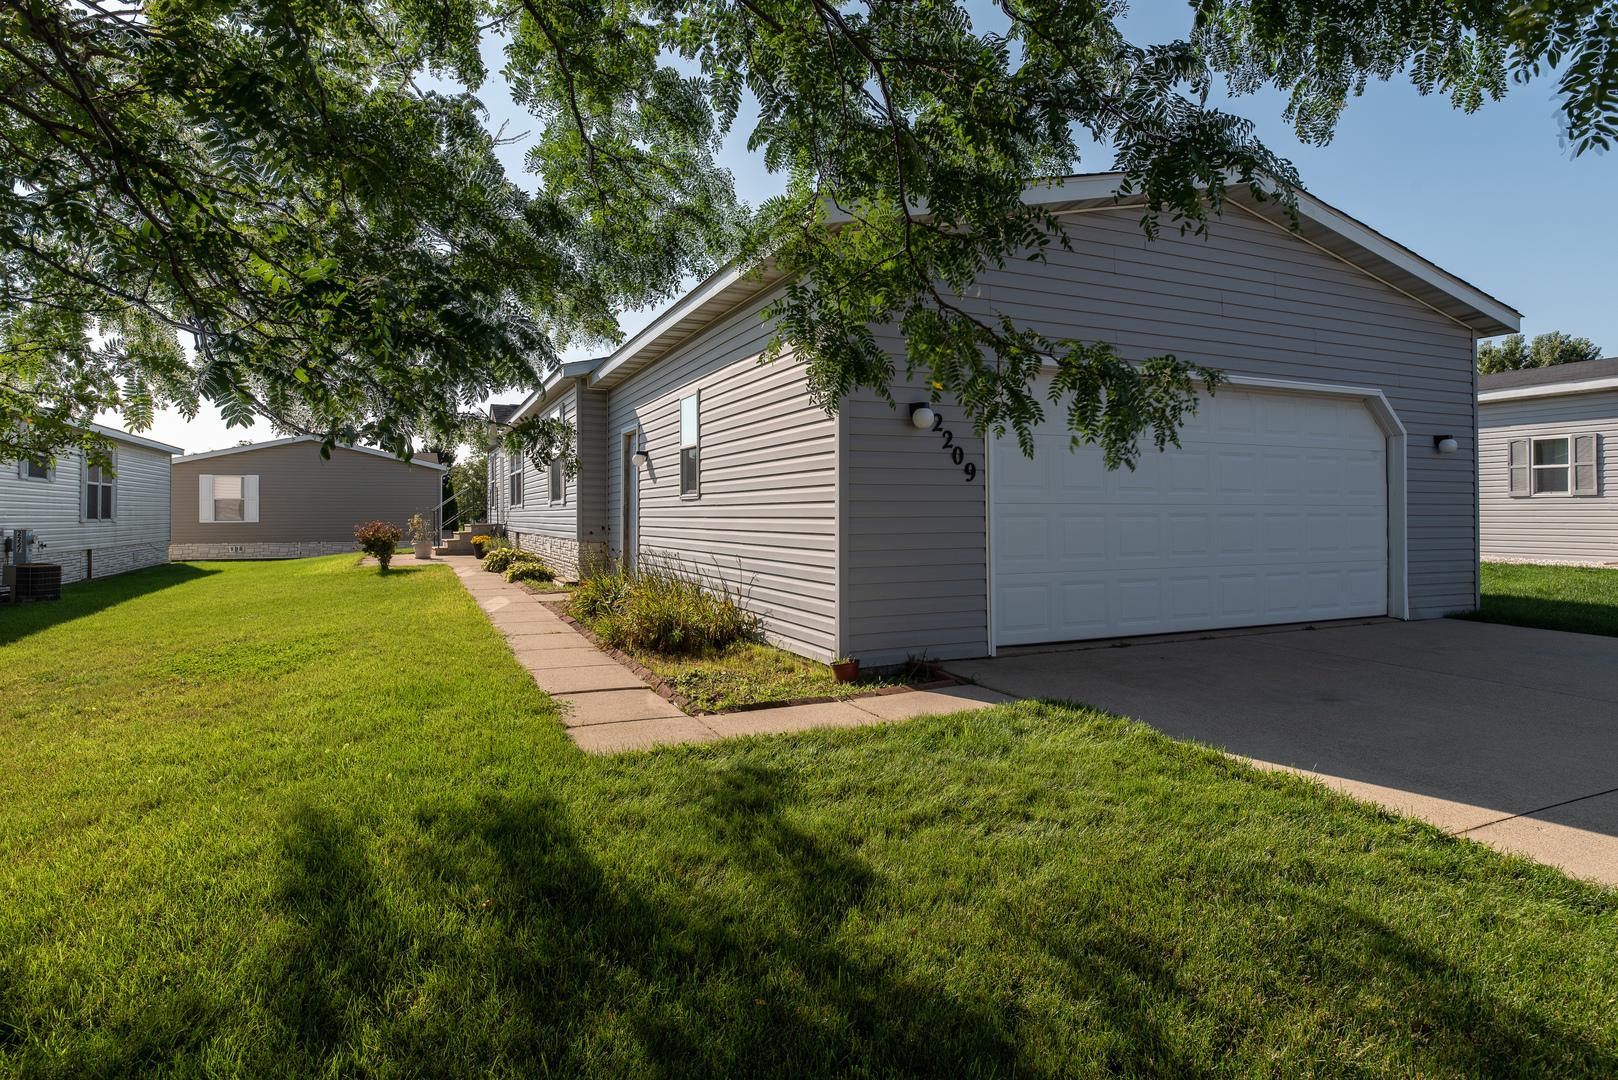 2209 BLOSSOM, Belvidere, Illinois, 61008